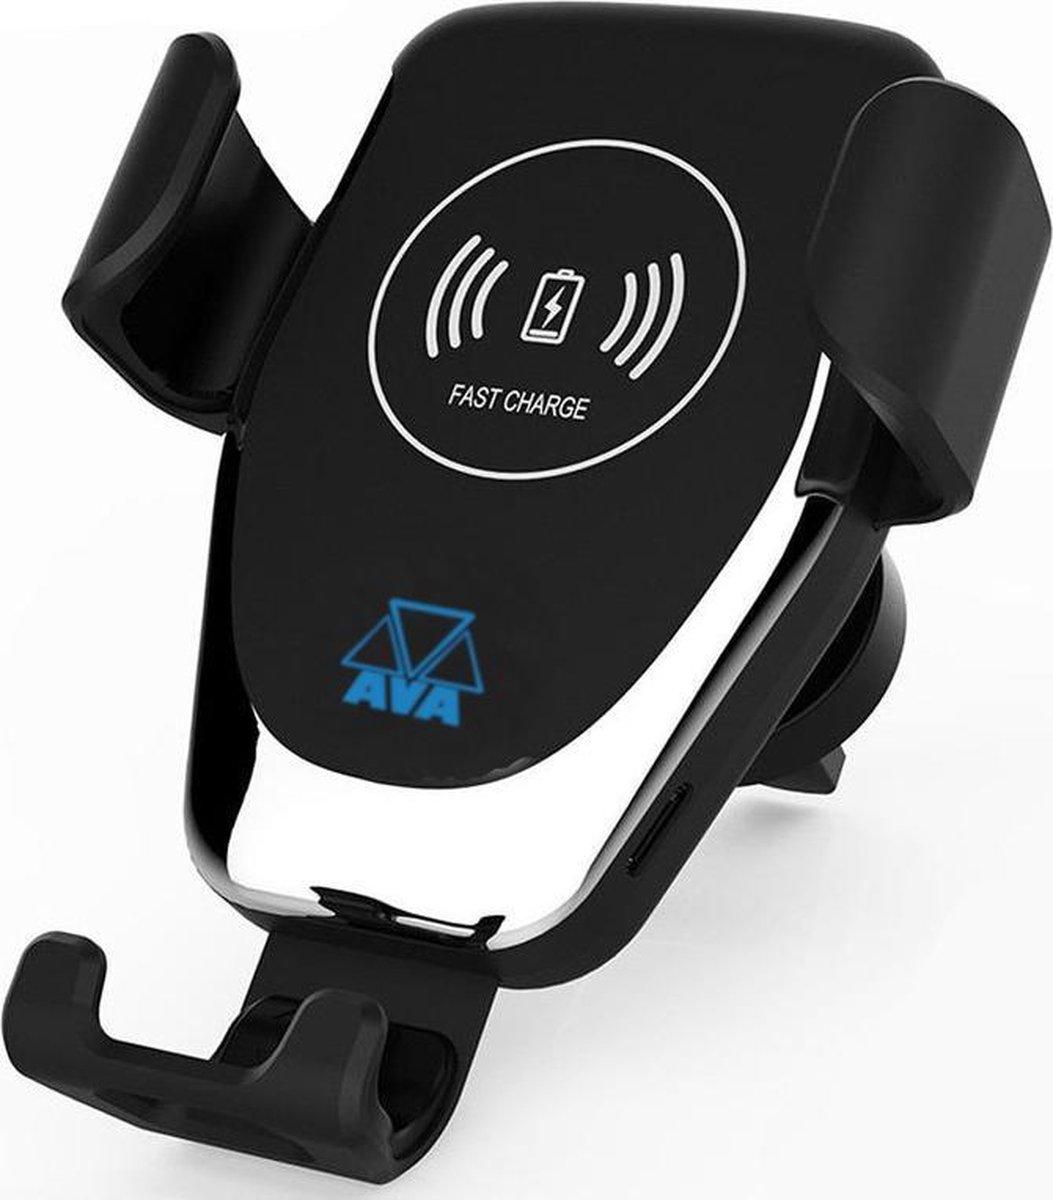 AVA Draadloze Telefoonhouder Auto - Draadloze Oplader QI - Universeel - Telefoonhouder Iphone / Sams